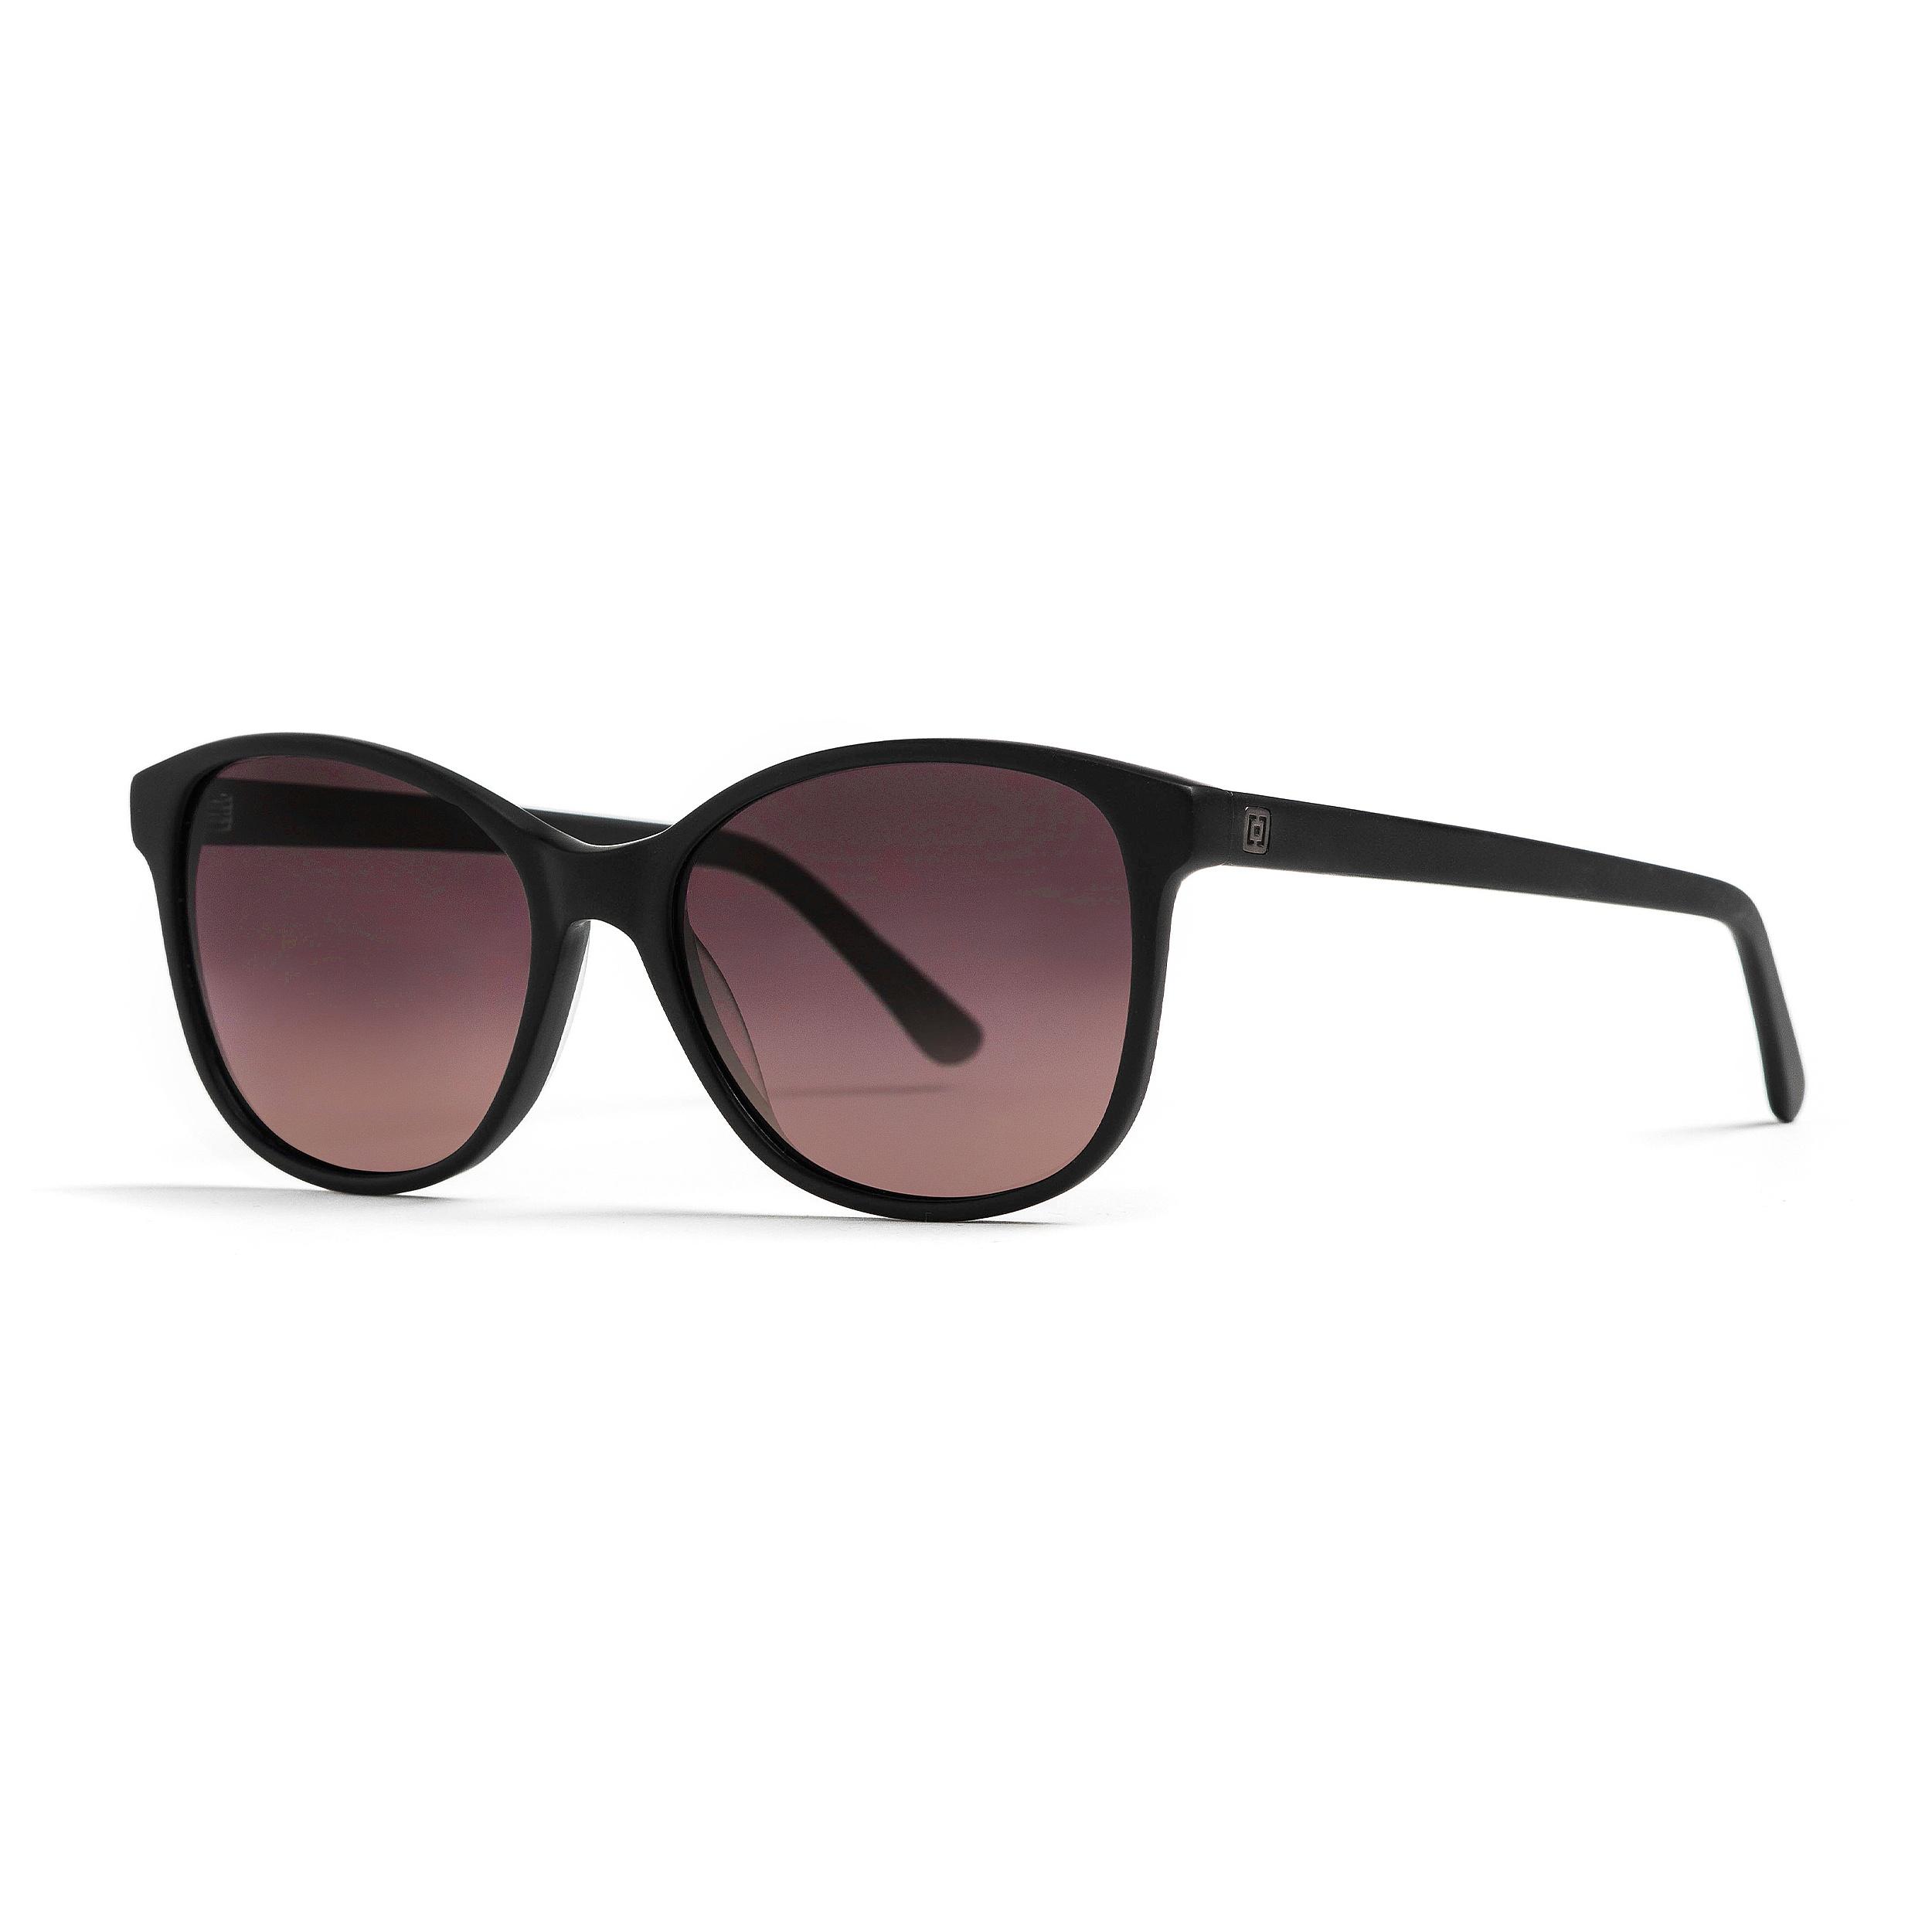 brýle Horsefeathers Chloe - Matt Black/Violet Fade Out